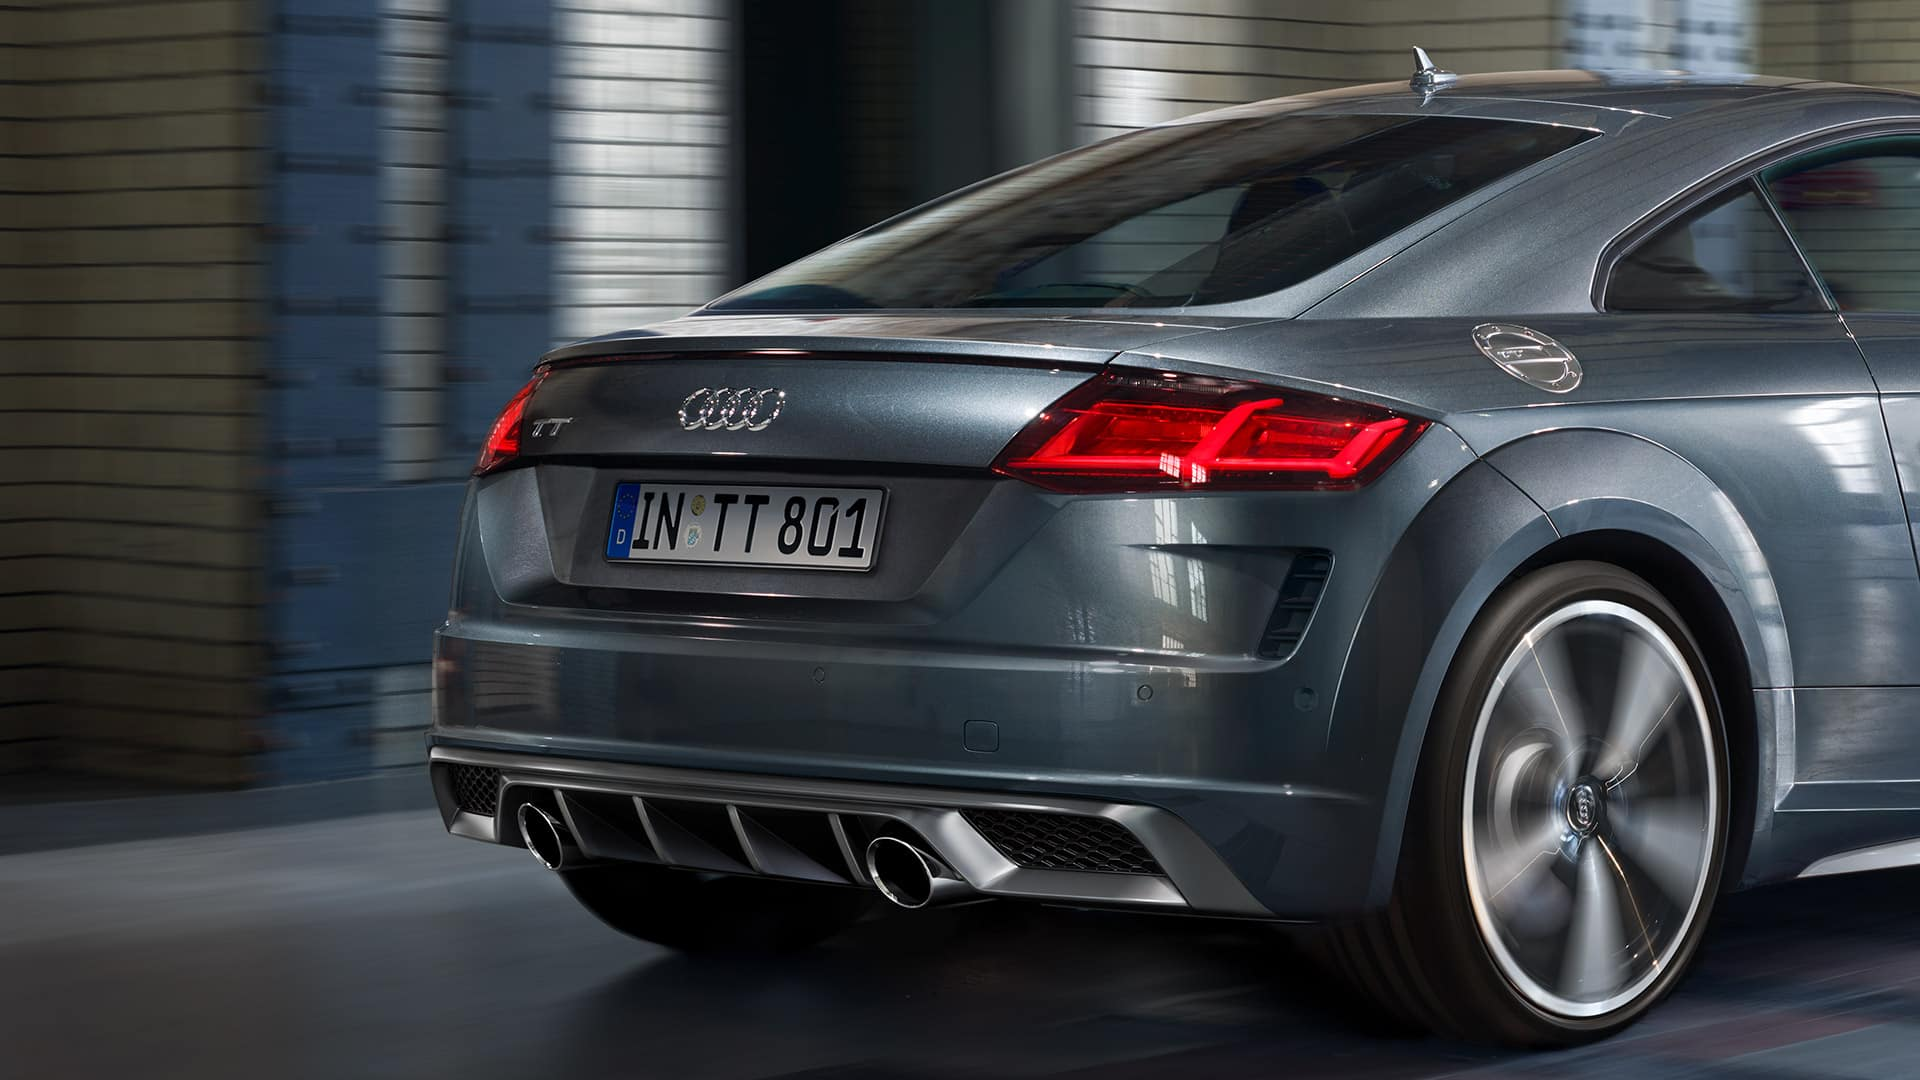 TT Coupé New Audi TT Models Audi SA Home Audi SA - Audi tt